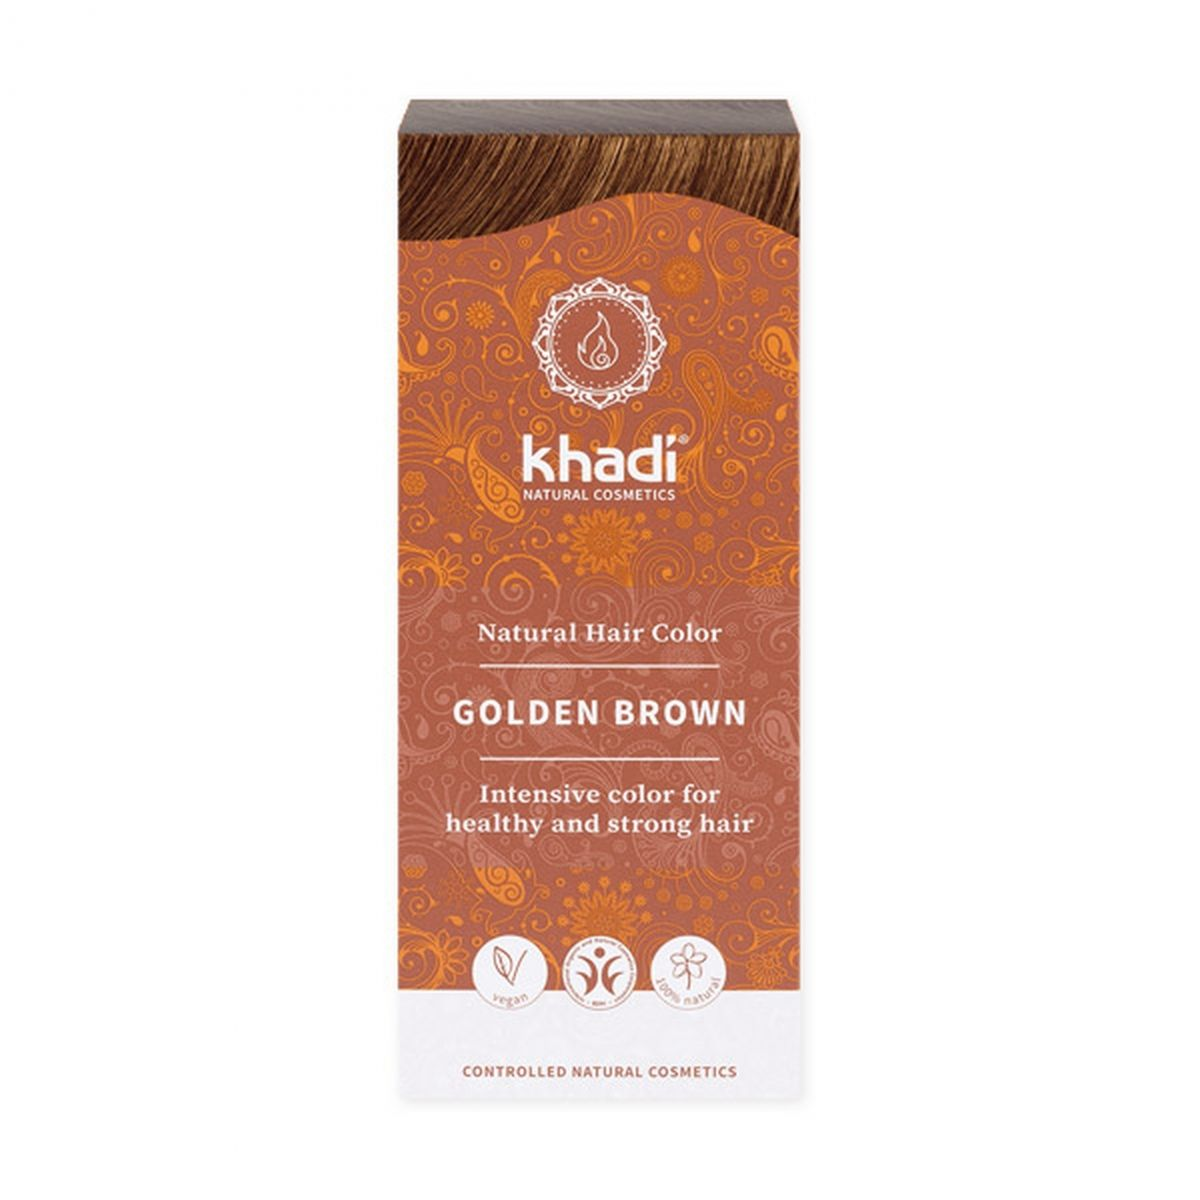 Naturalna indyjska henna - Złoty Brąz - 100g - Khadi